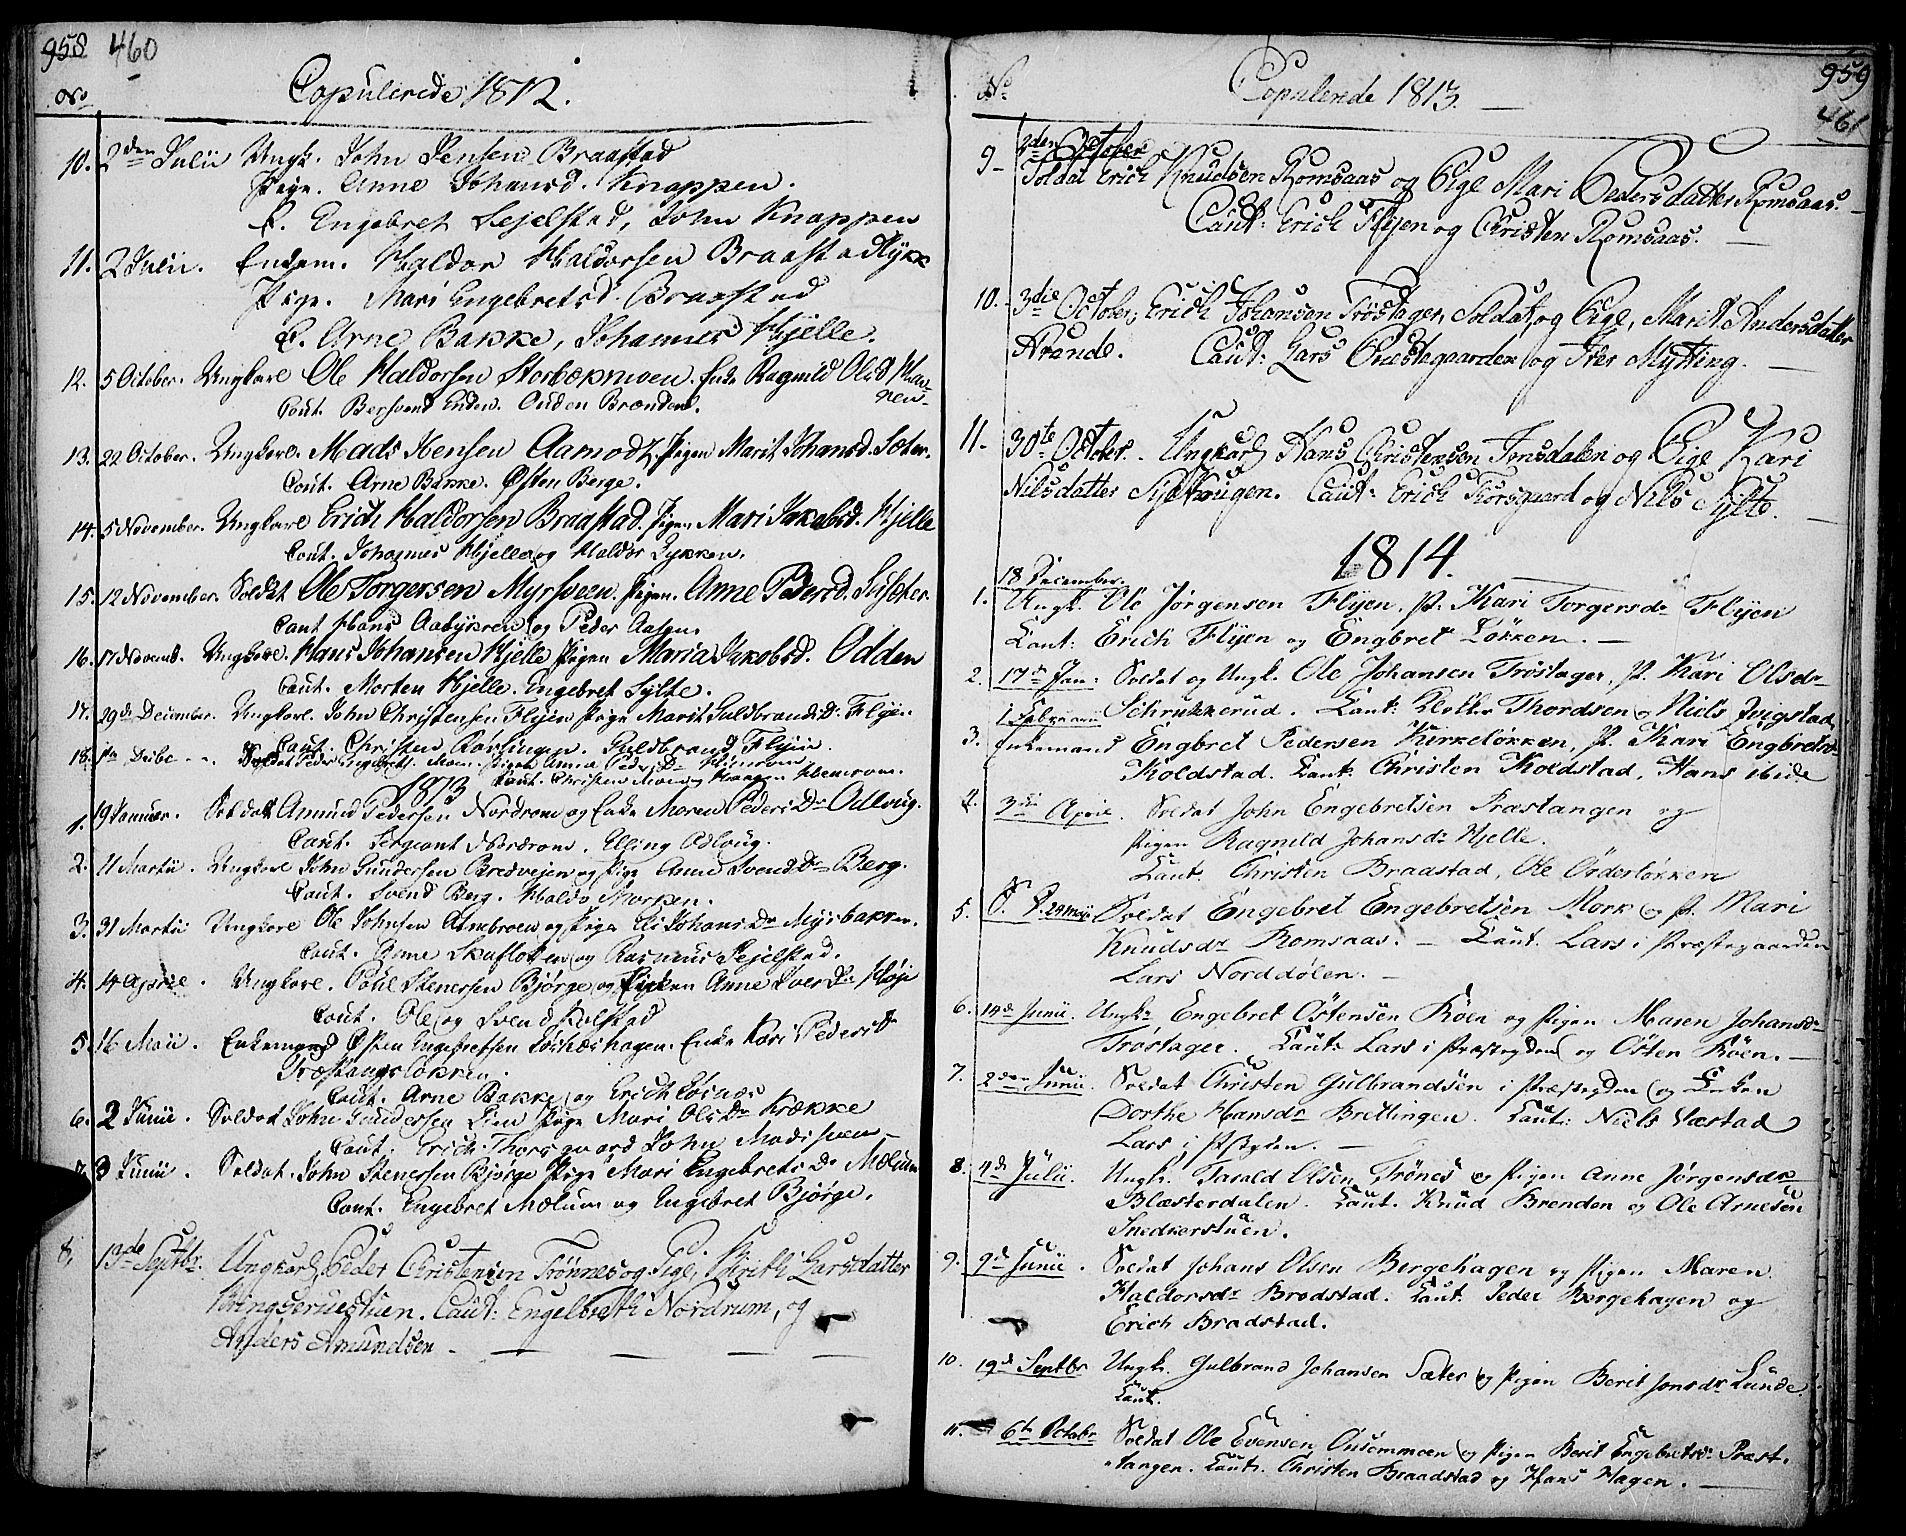 SAH, Ringebu prestekontor, Ministerialbok nr. 3, 1781-1820, s. 460-461